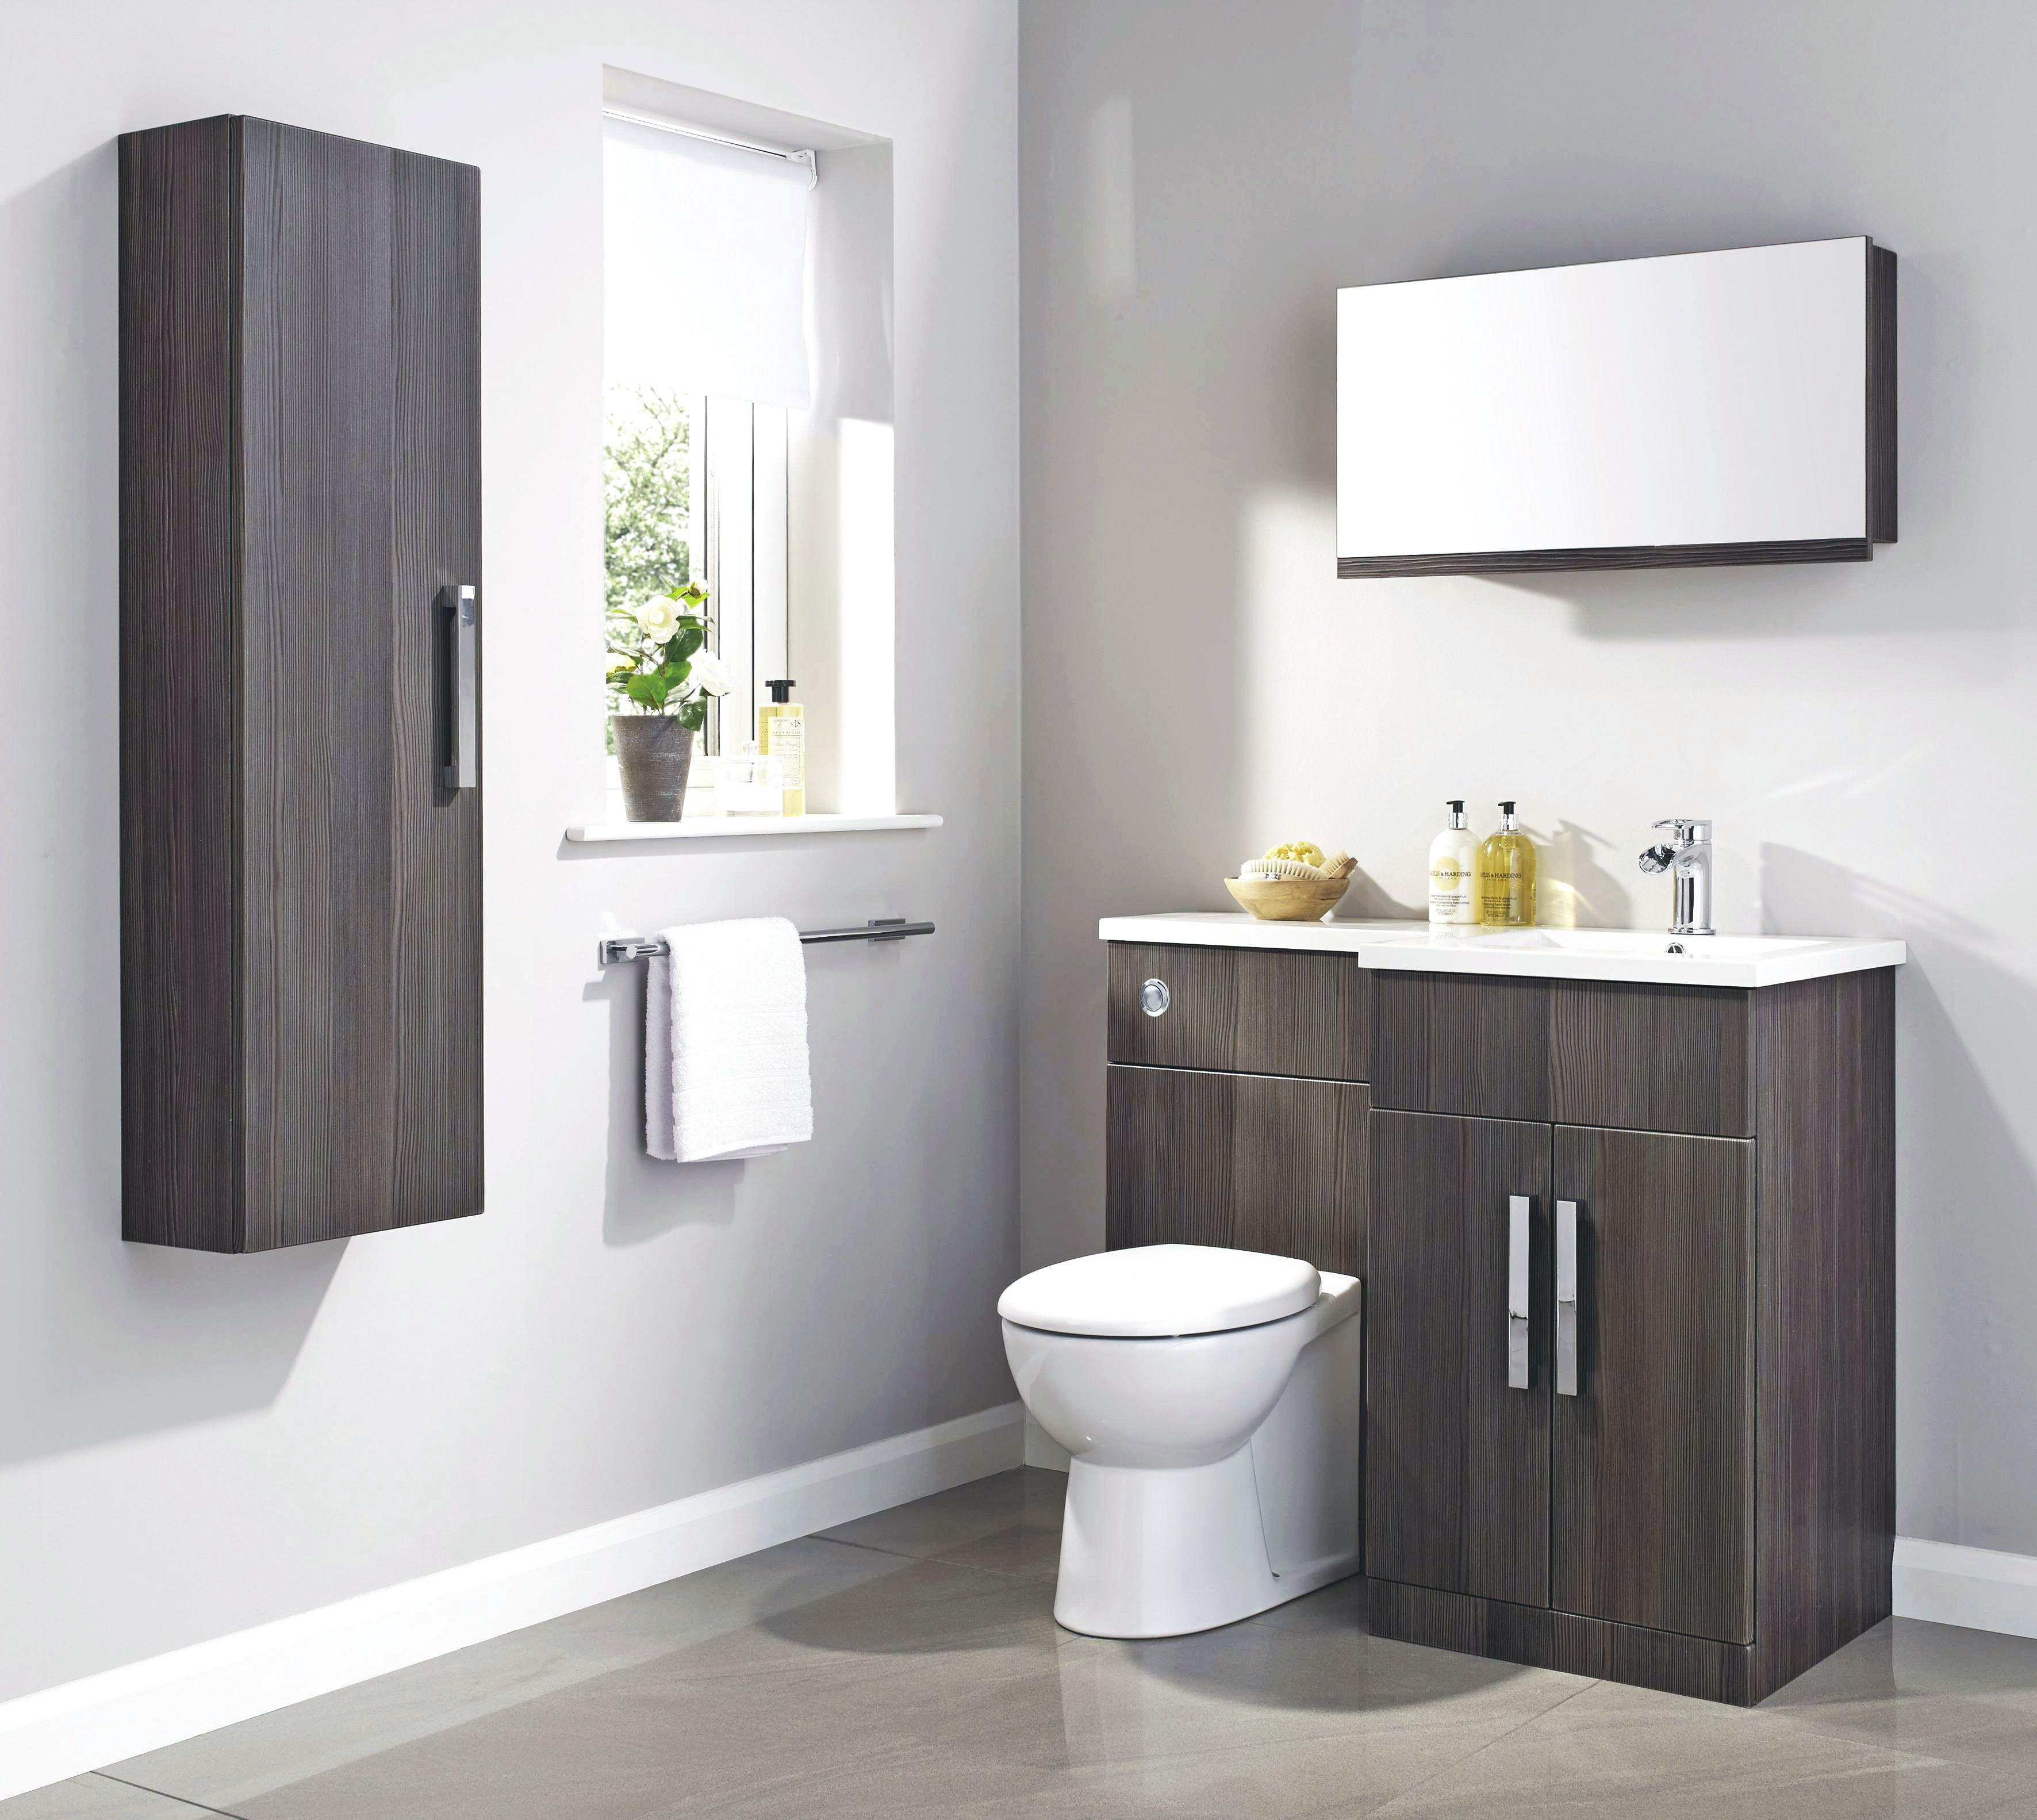 B q bathroom scales - Bathroom Accessories Bathroom Fittings Fixtures Diy At Bq